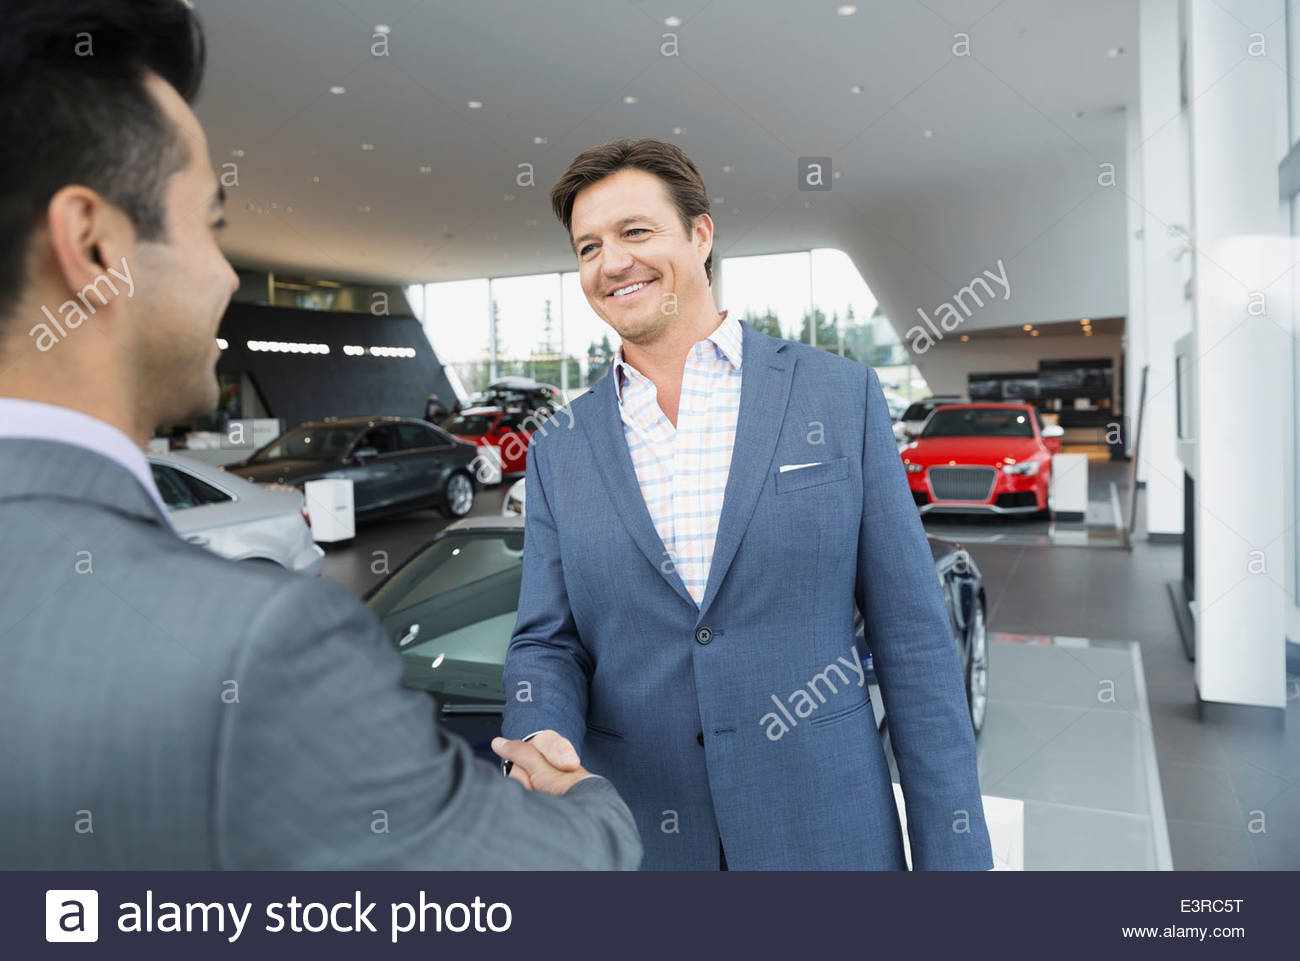 Salesman and man handshaking in car dealership showroom - Stock Image